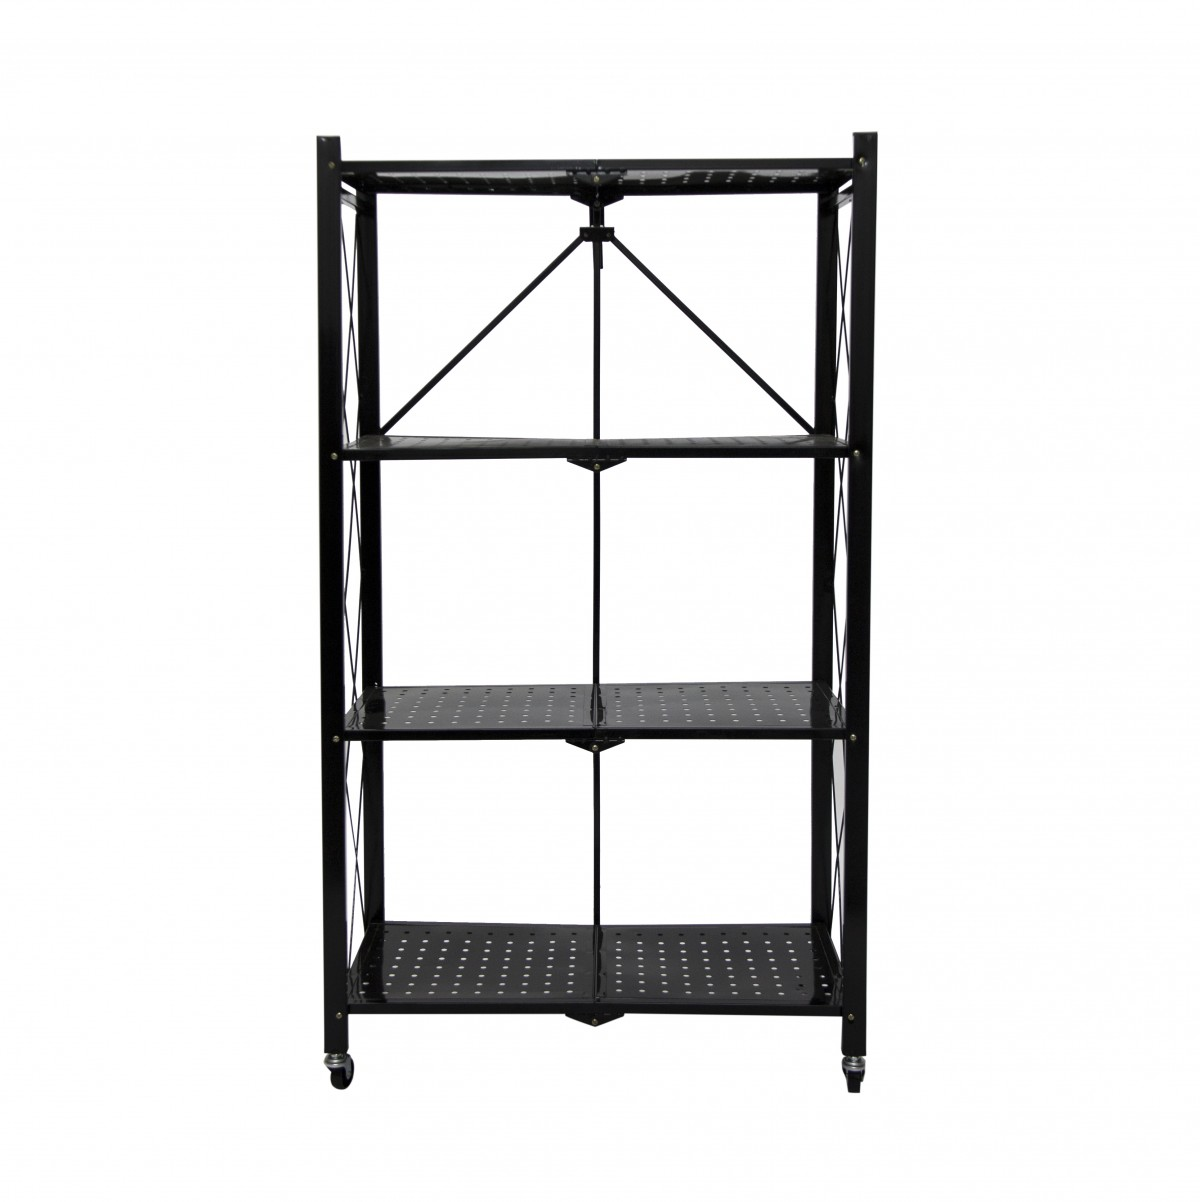 Fine Living Foldable Storage Rack-Black Metal 4 La